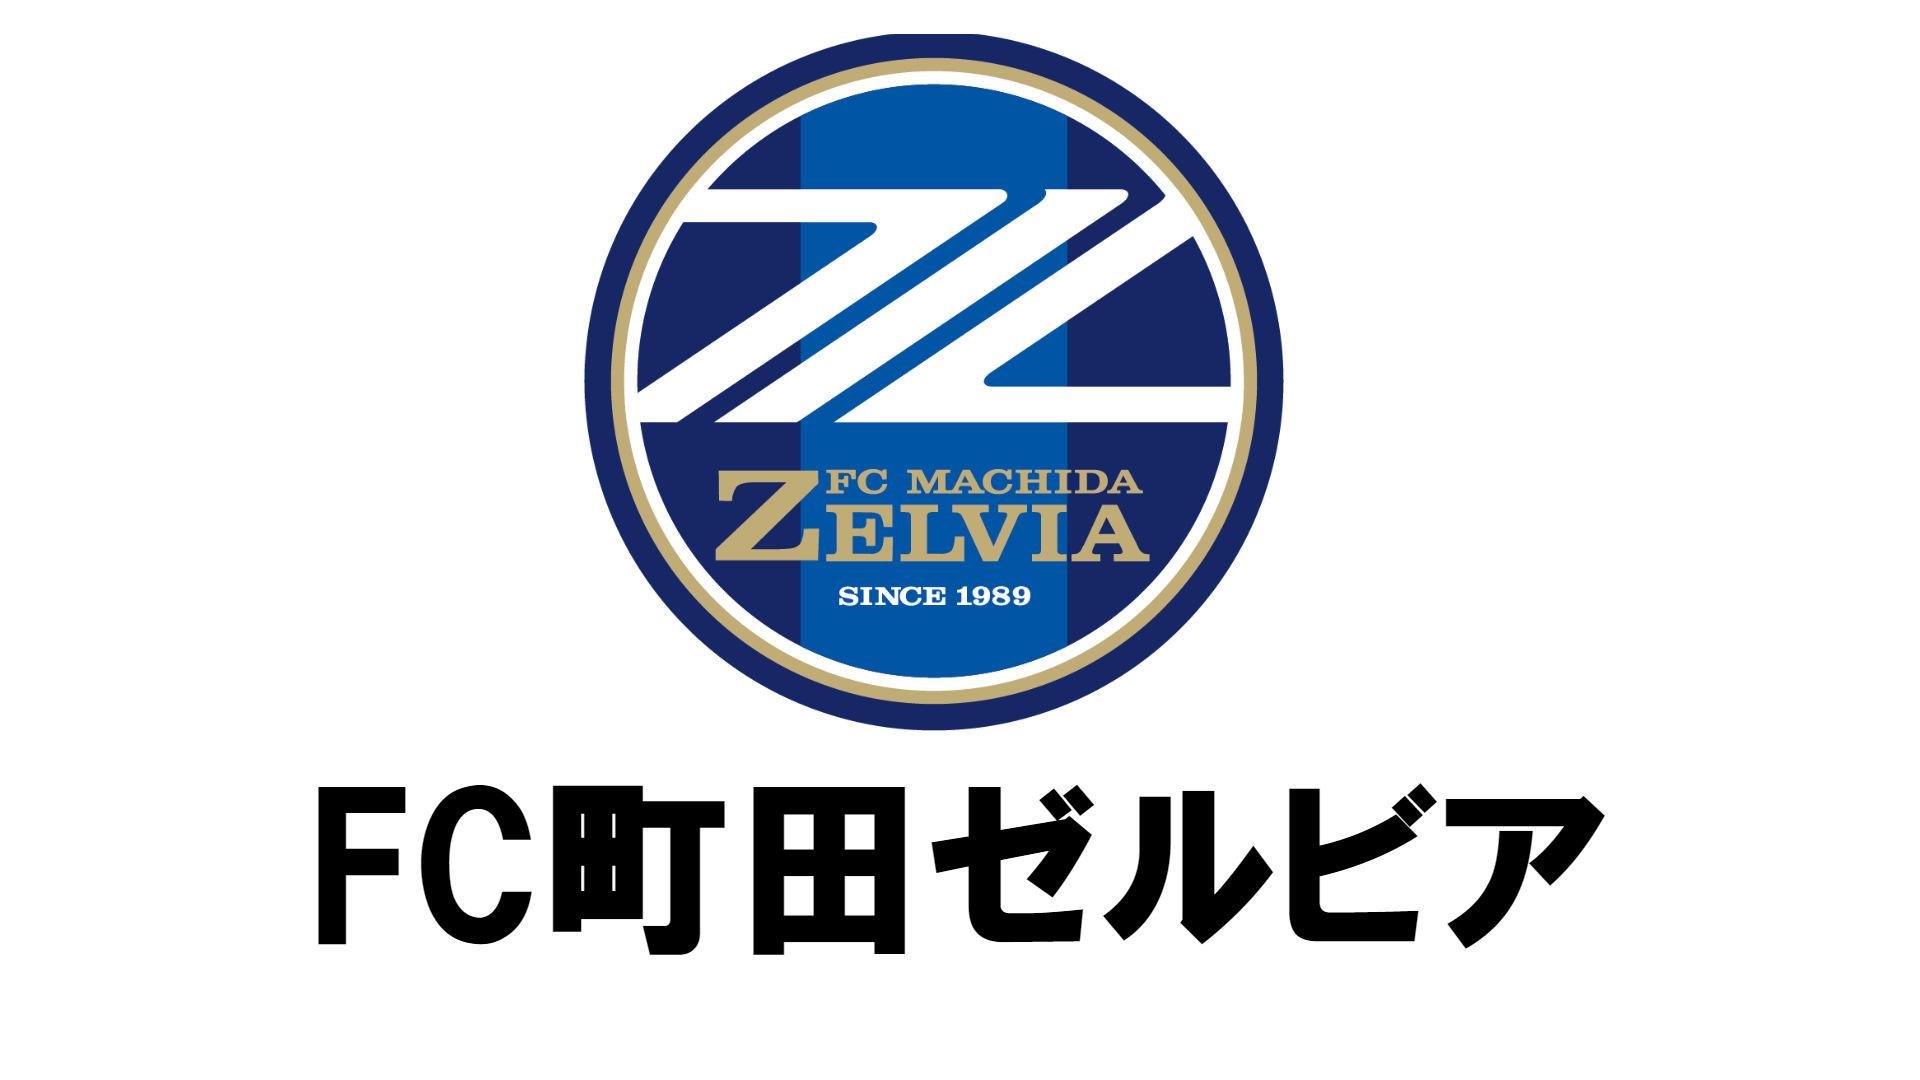 FC町田ゼルビア.jpg